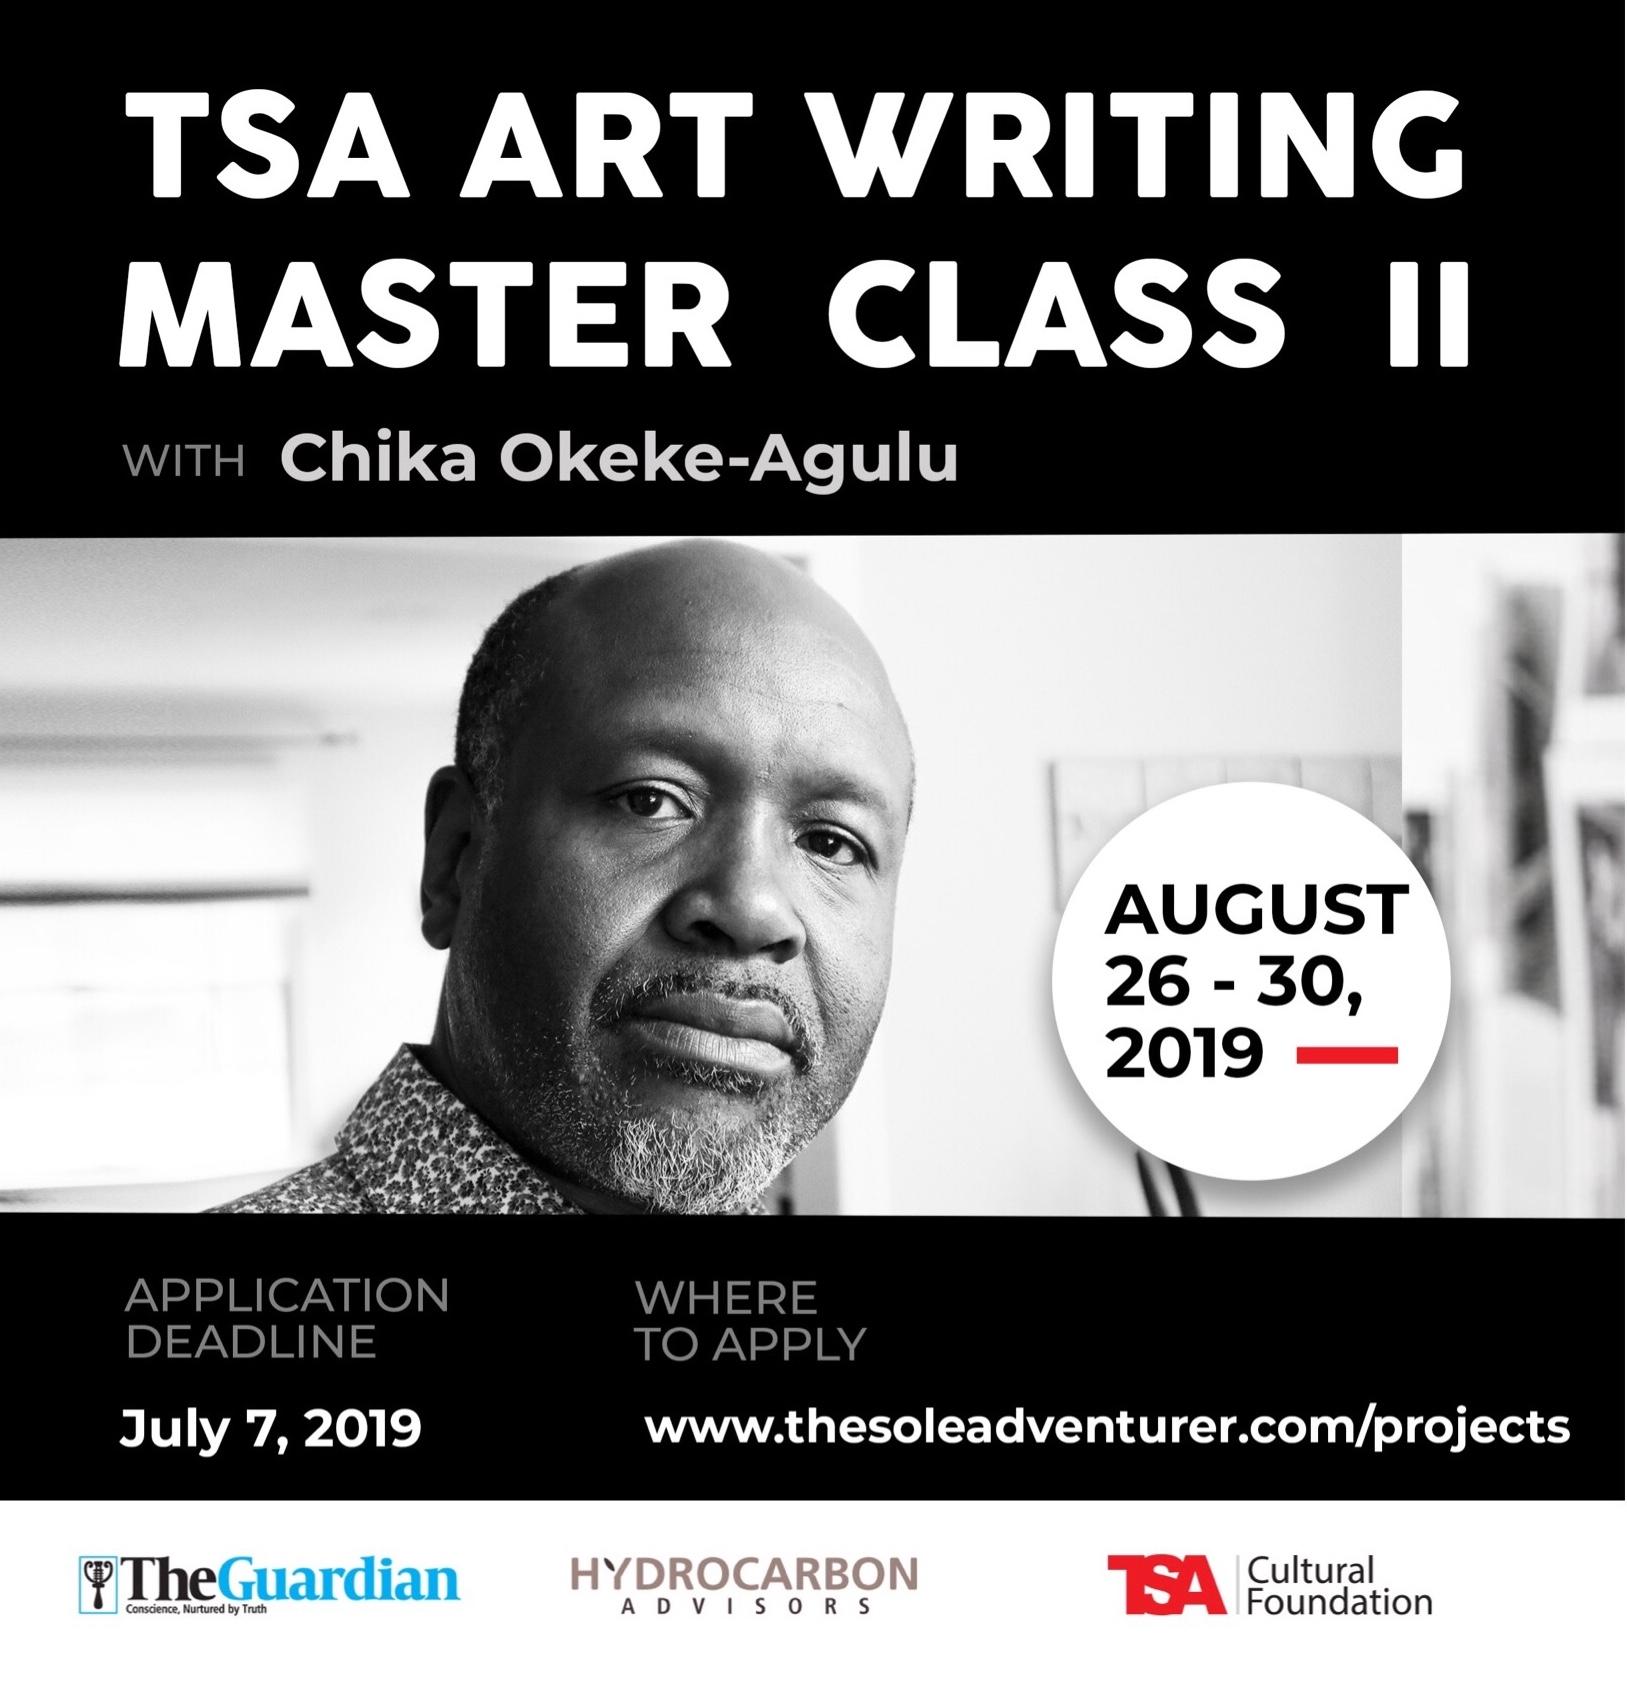 TSA Art writing master class poster